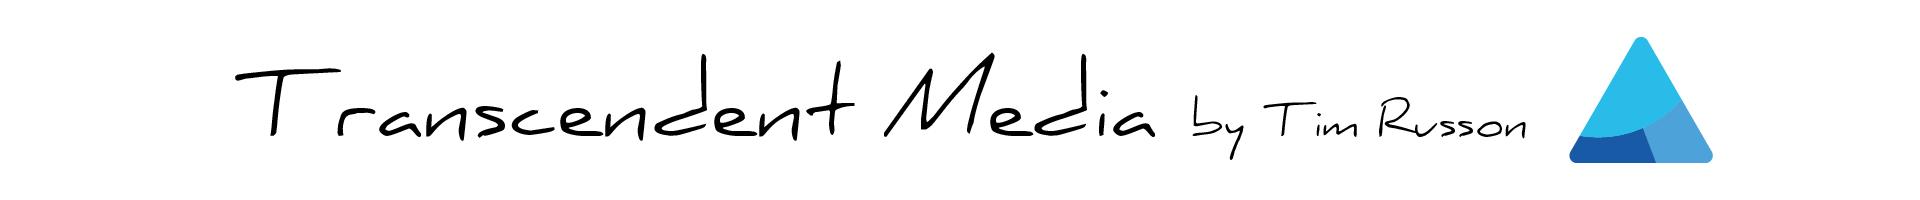 Transcendent Media